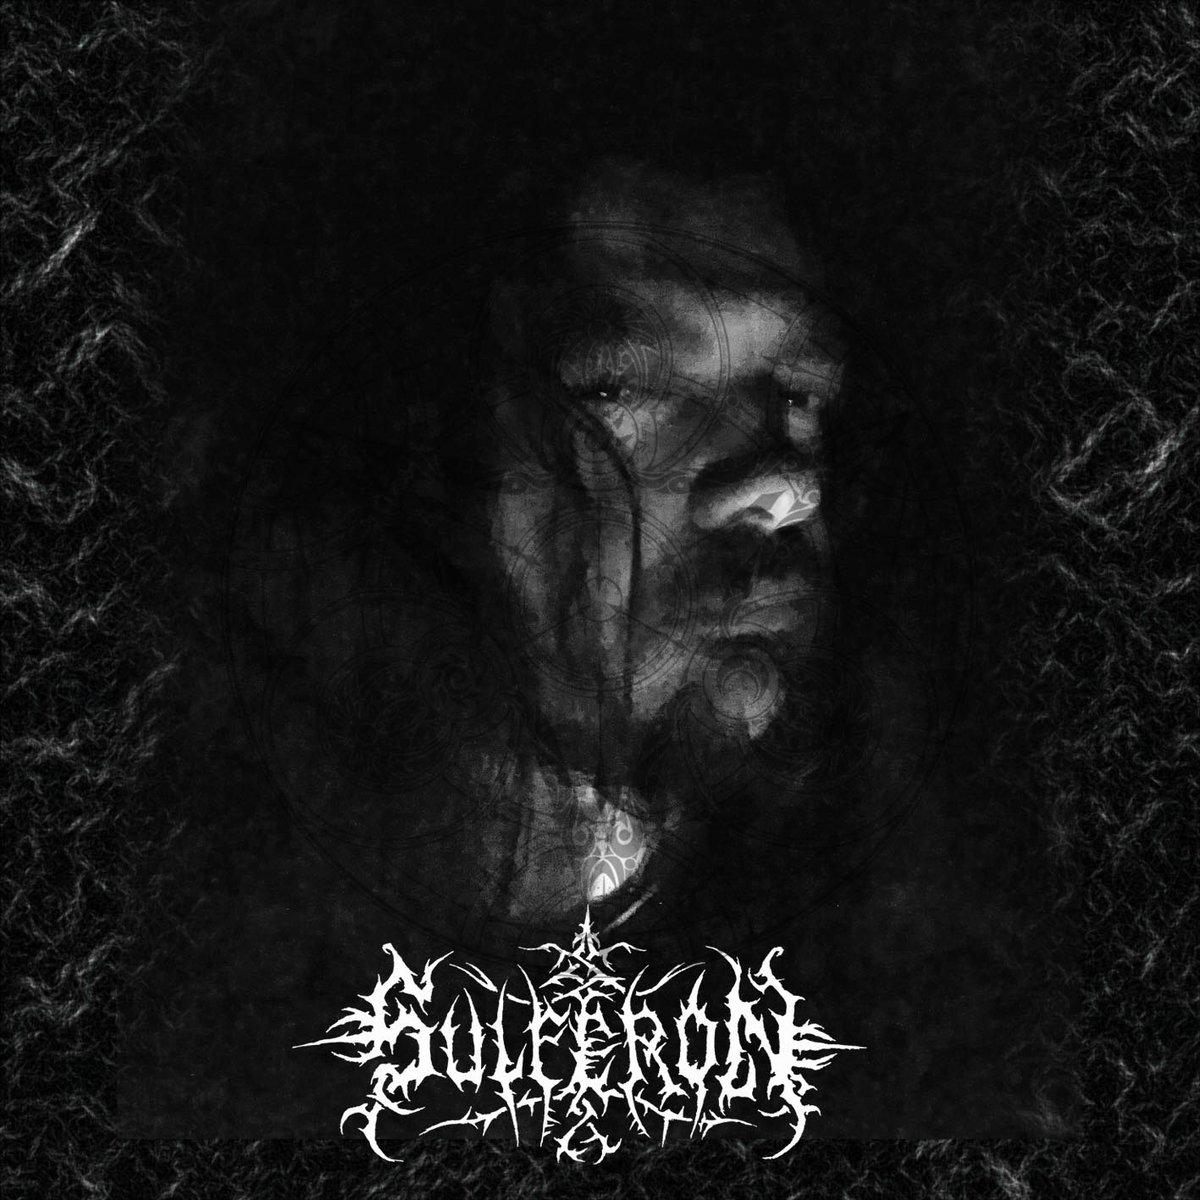 Sulferon - Photo